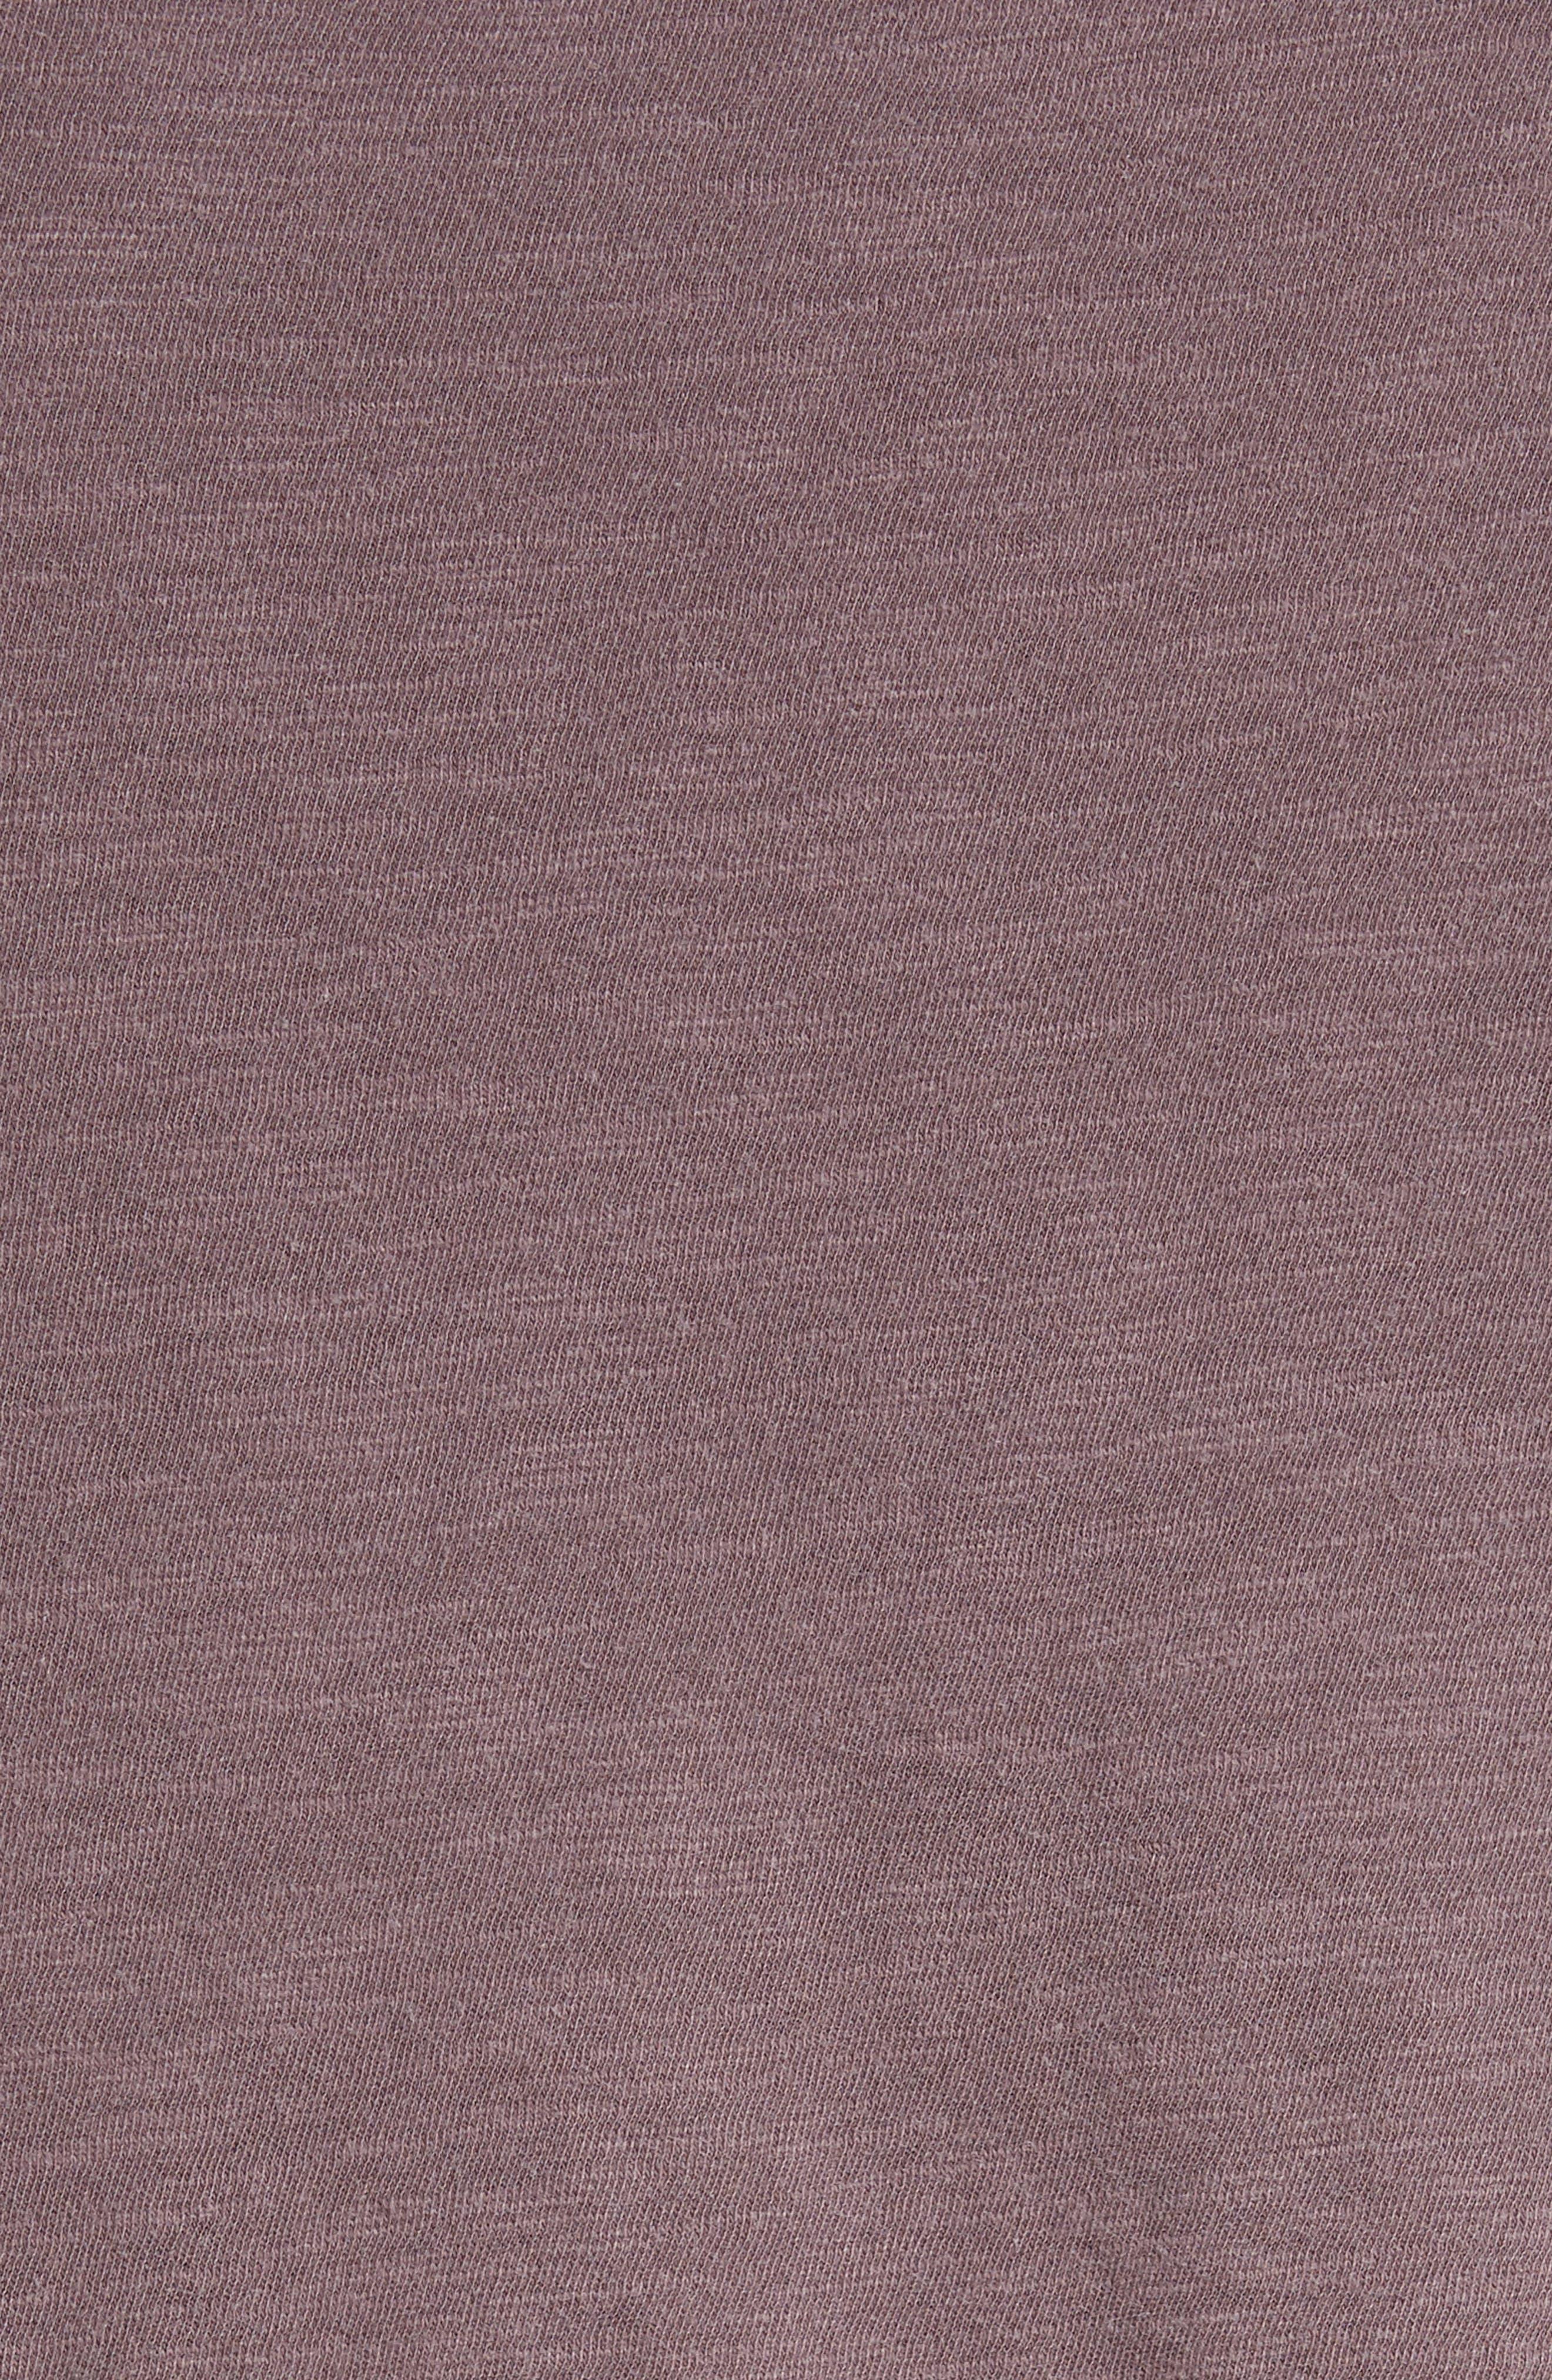 Long Sleeve Cotton Jersey Henley,                             Alternate thumbnail 15, color,